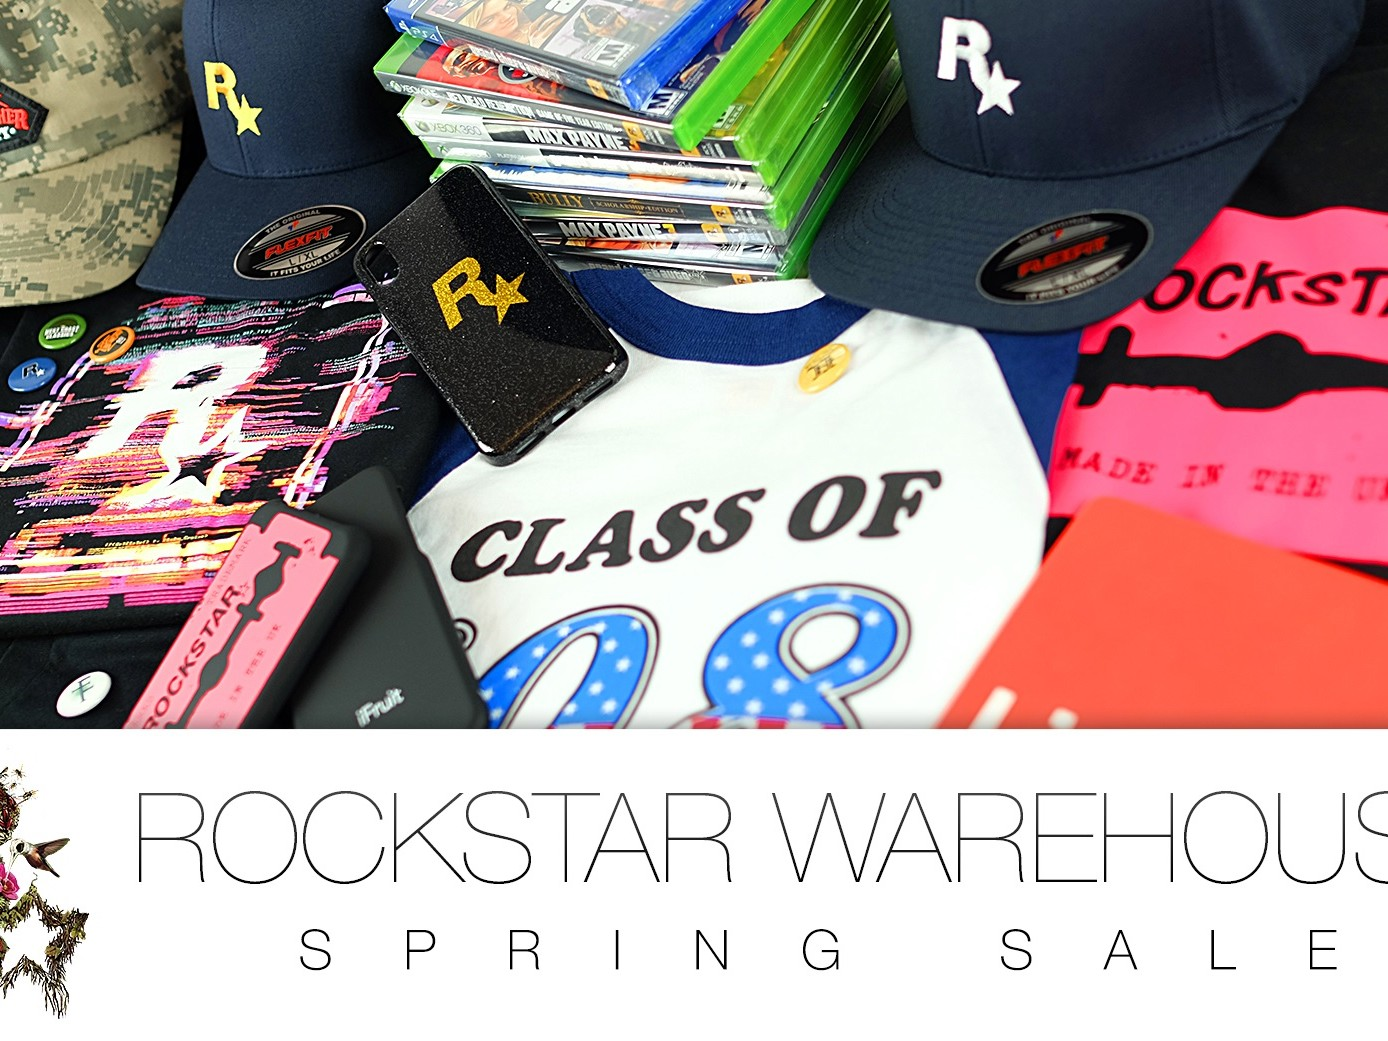 Spring Sale du Rockstar Warehouse